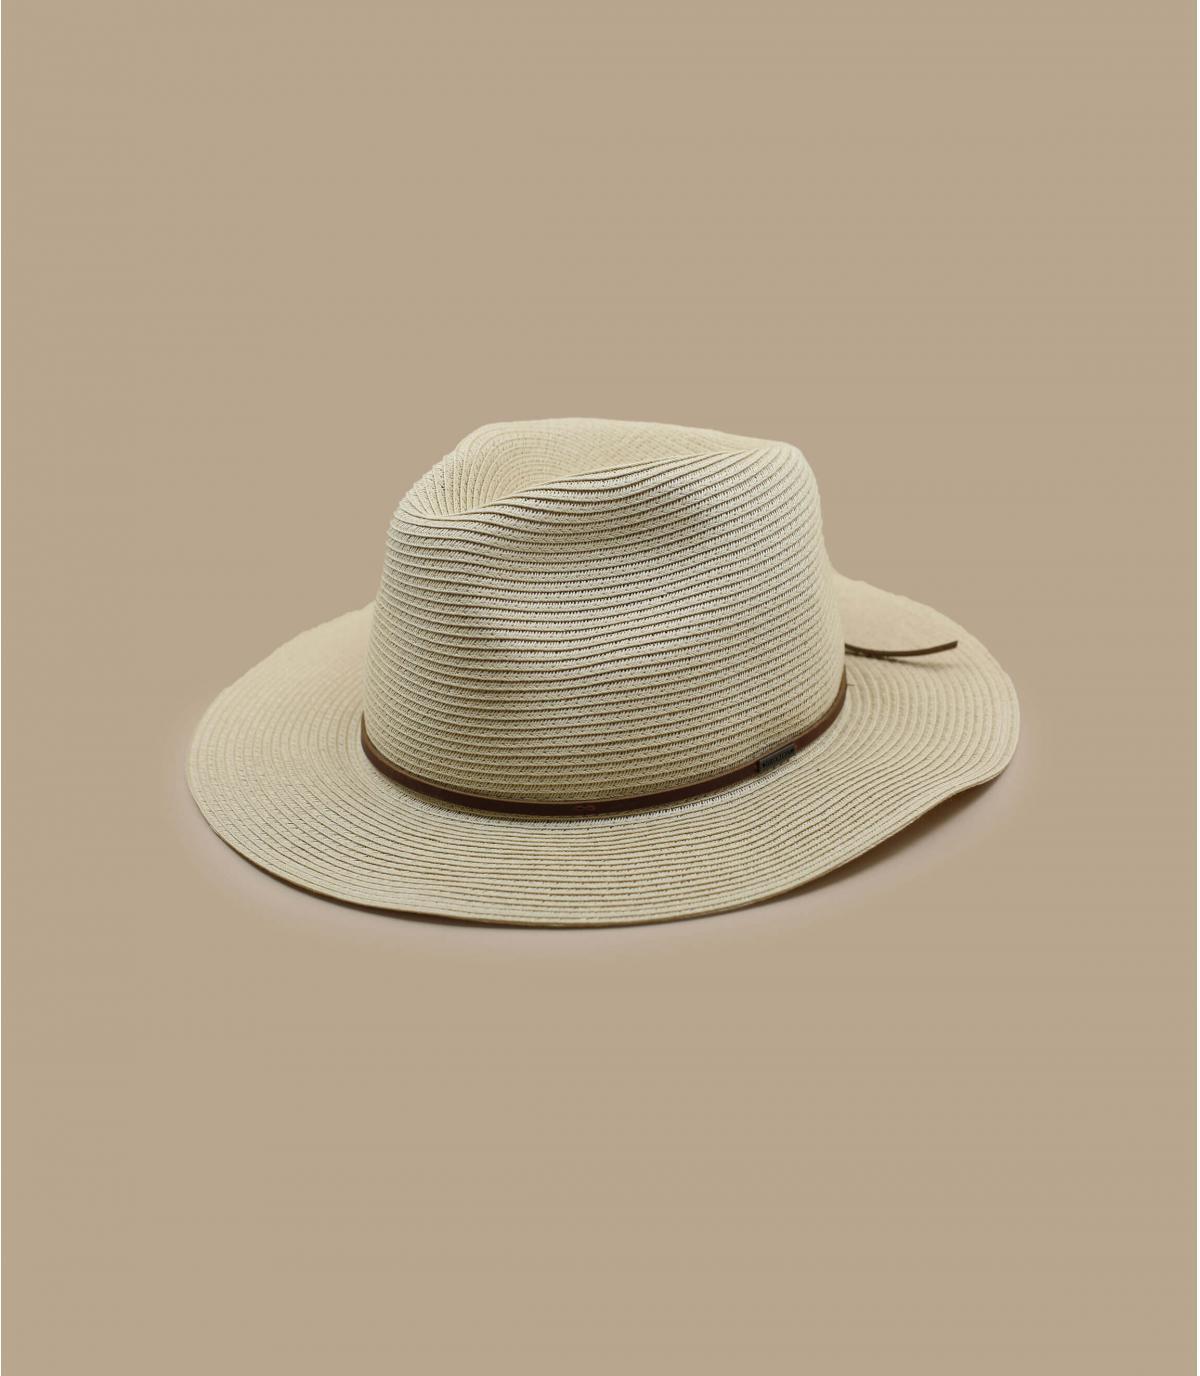 Brixton opvouwbare strooien hoed